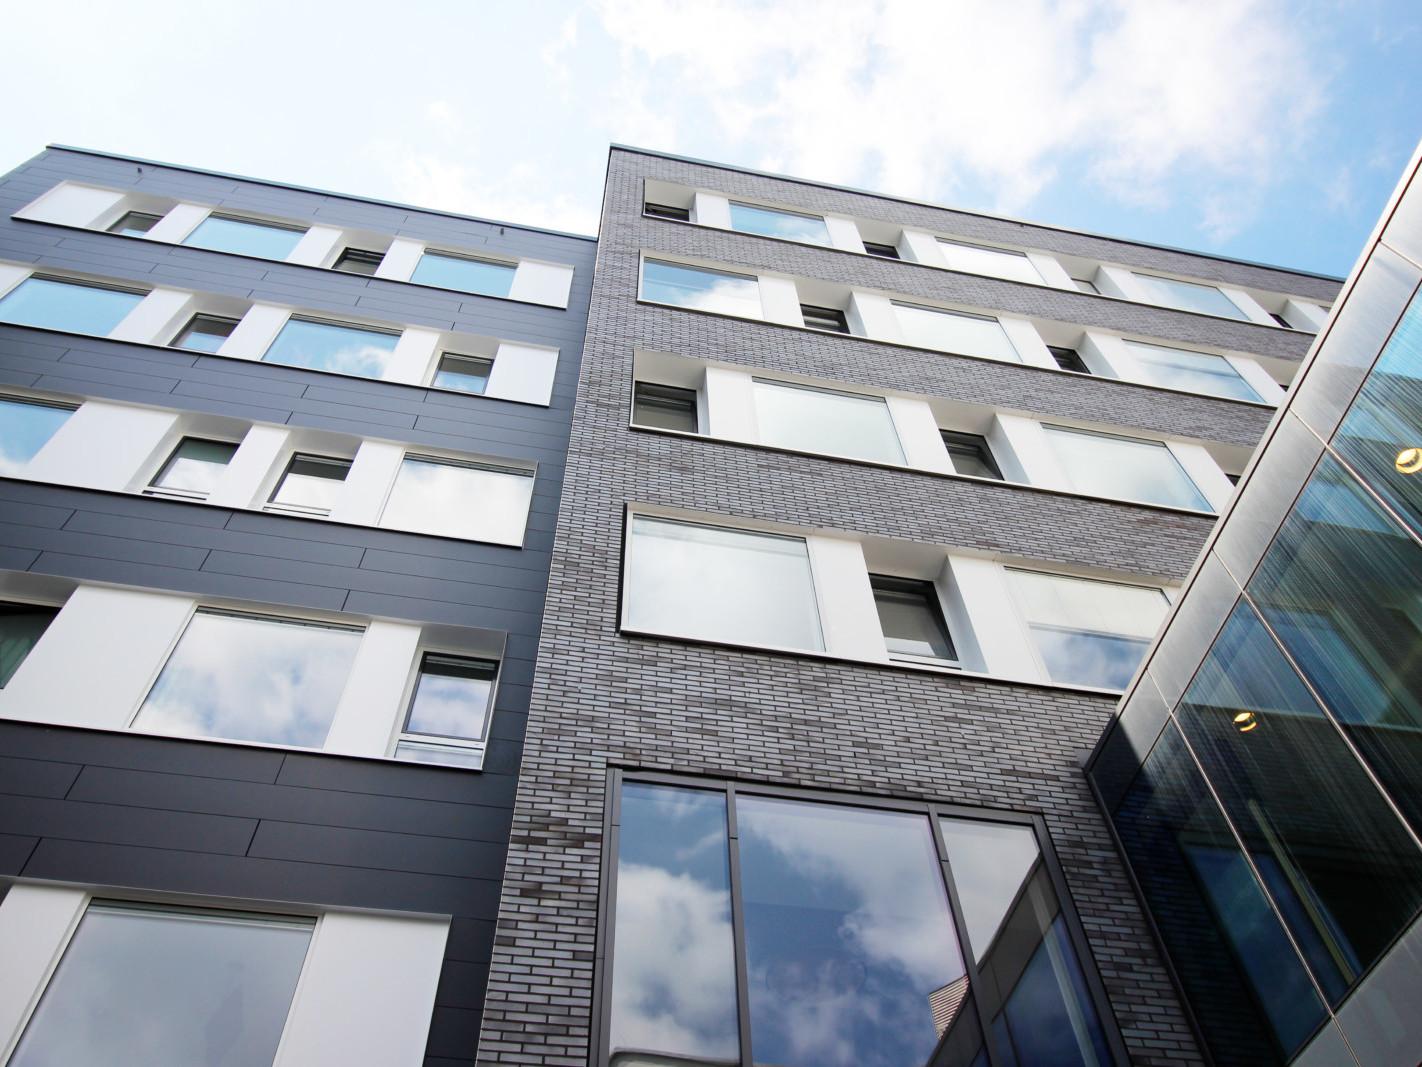 Verbindungsbau_JoHo Dortmund_Fassade